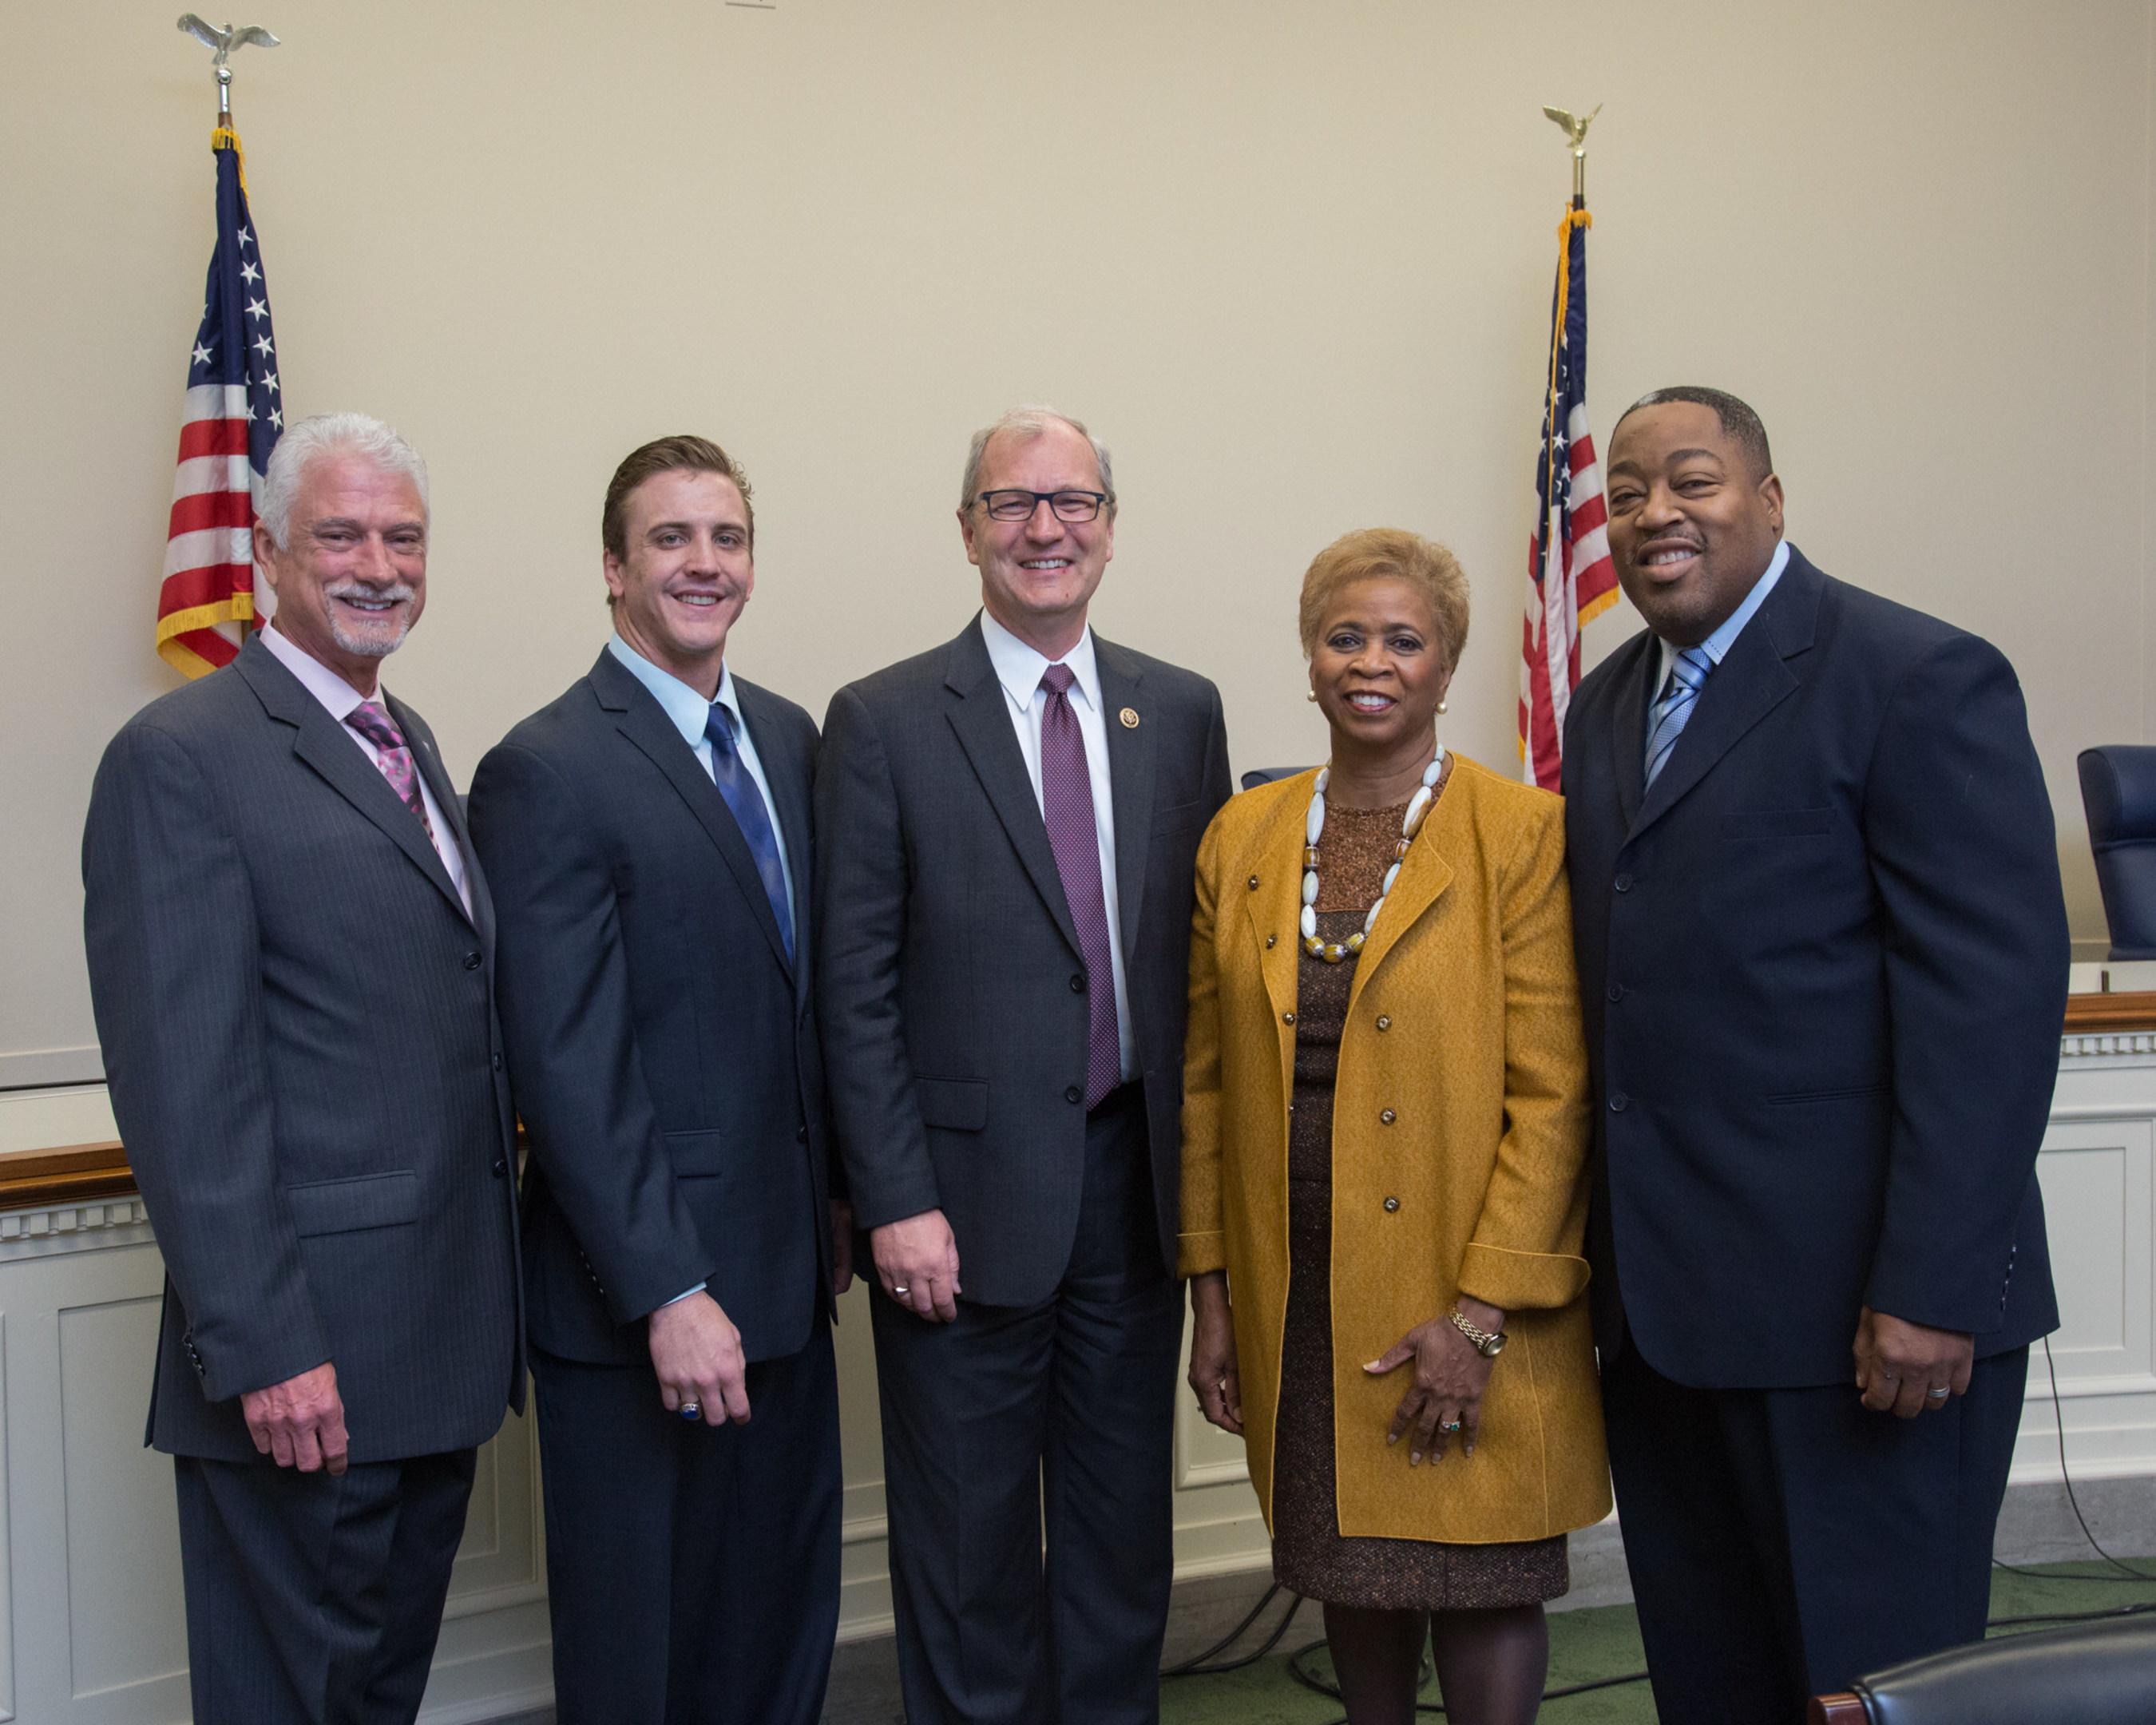 Left to Right: Dana Kuhn, PSI President; Jordan Martin, SC Hemophilia; Advocate Congressman Kevin Cramer (R-ND); Ms. LaVarne Burton, President and CEO of the American Kidney Fund; Mr. Eric Dolby, NC Kidney Fund Advocate